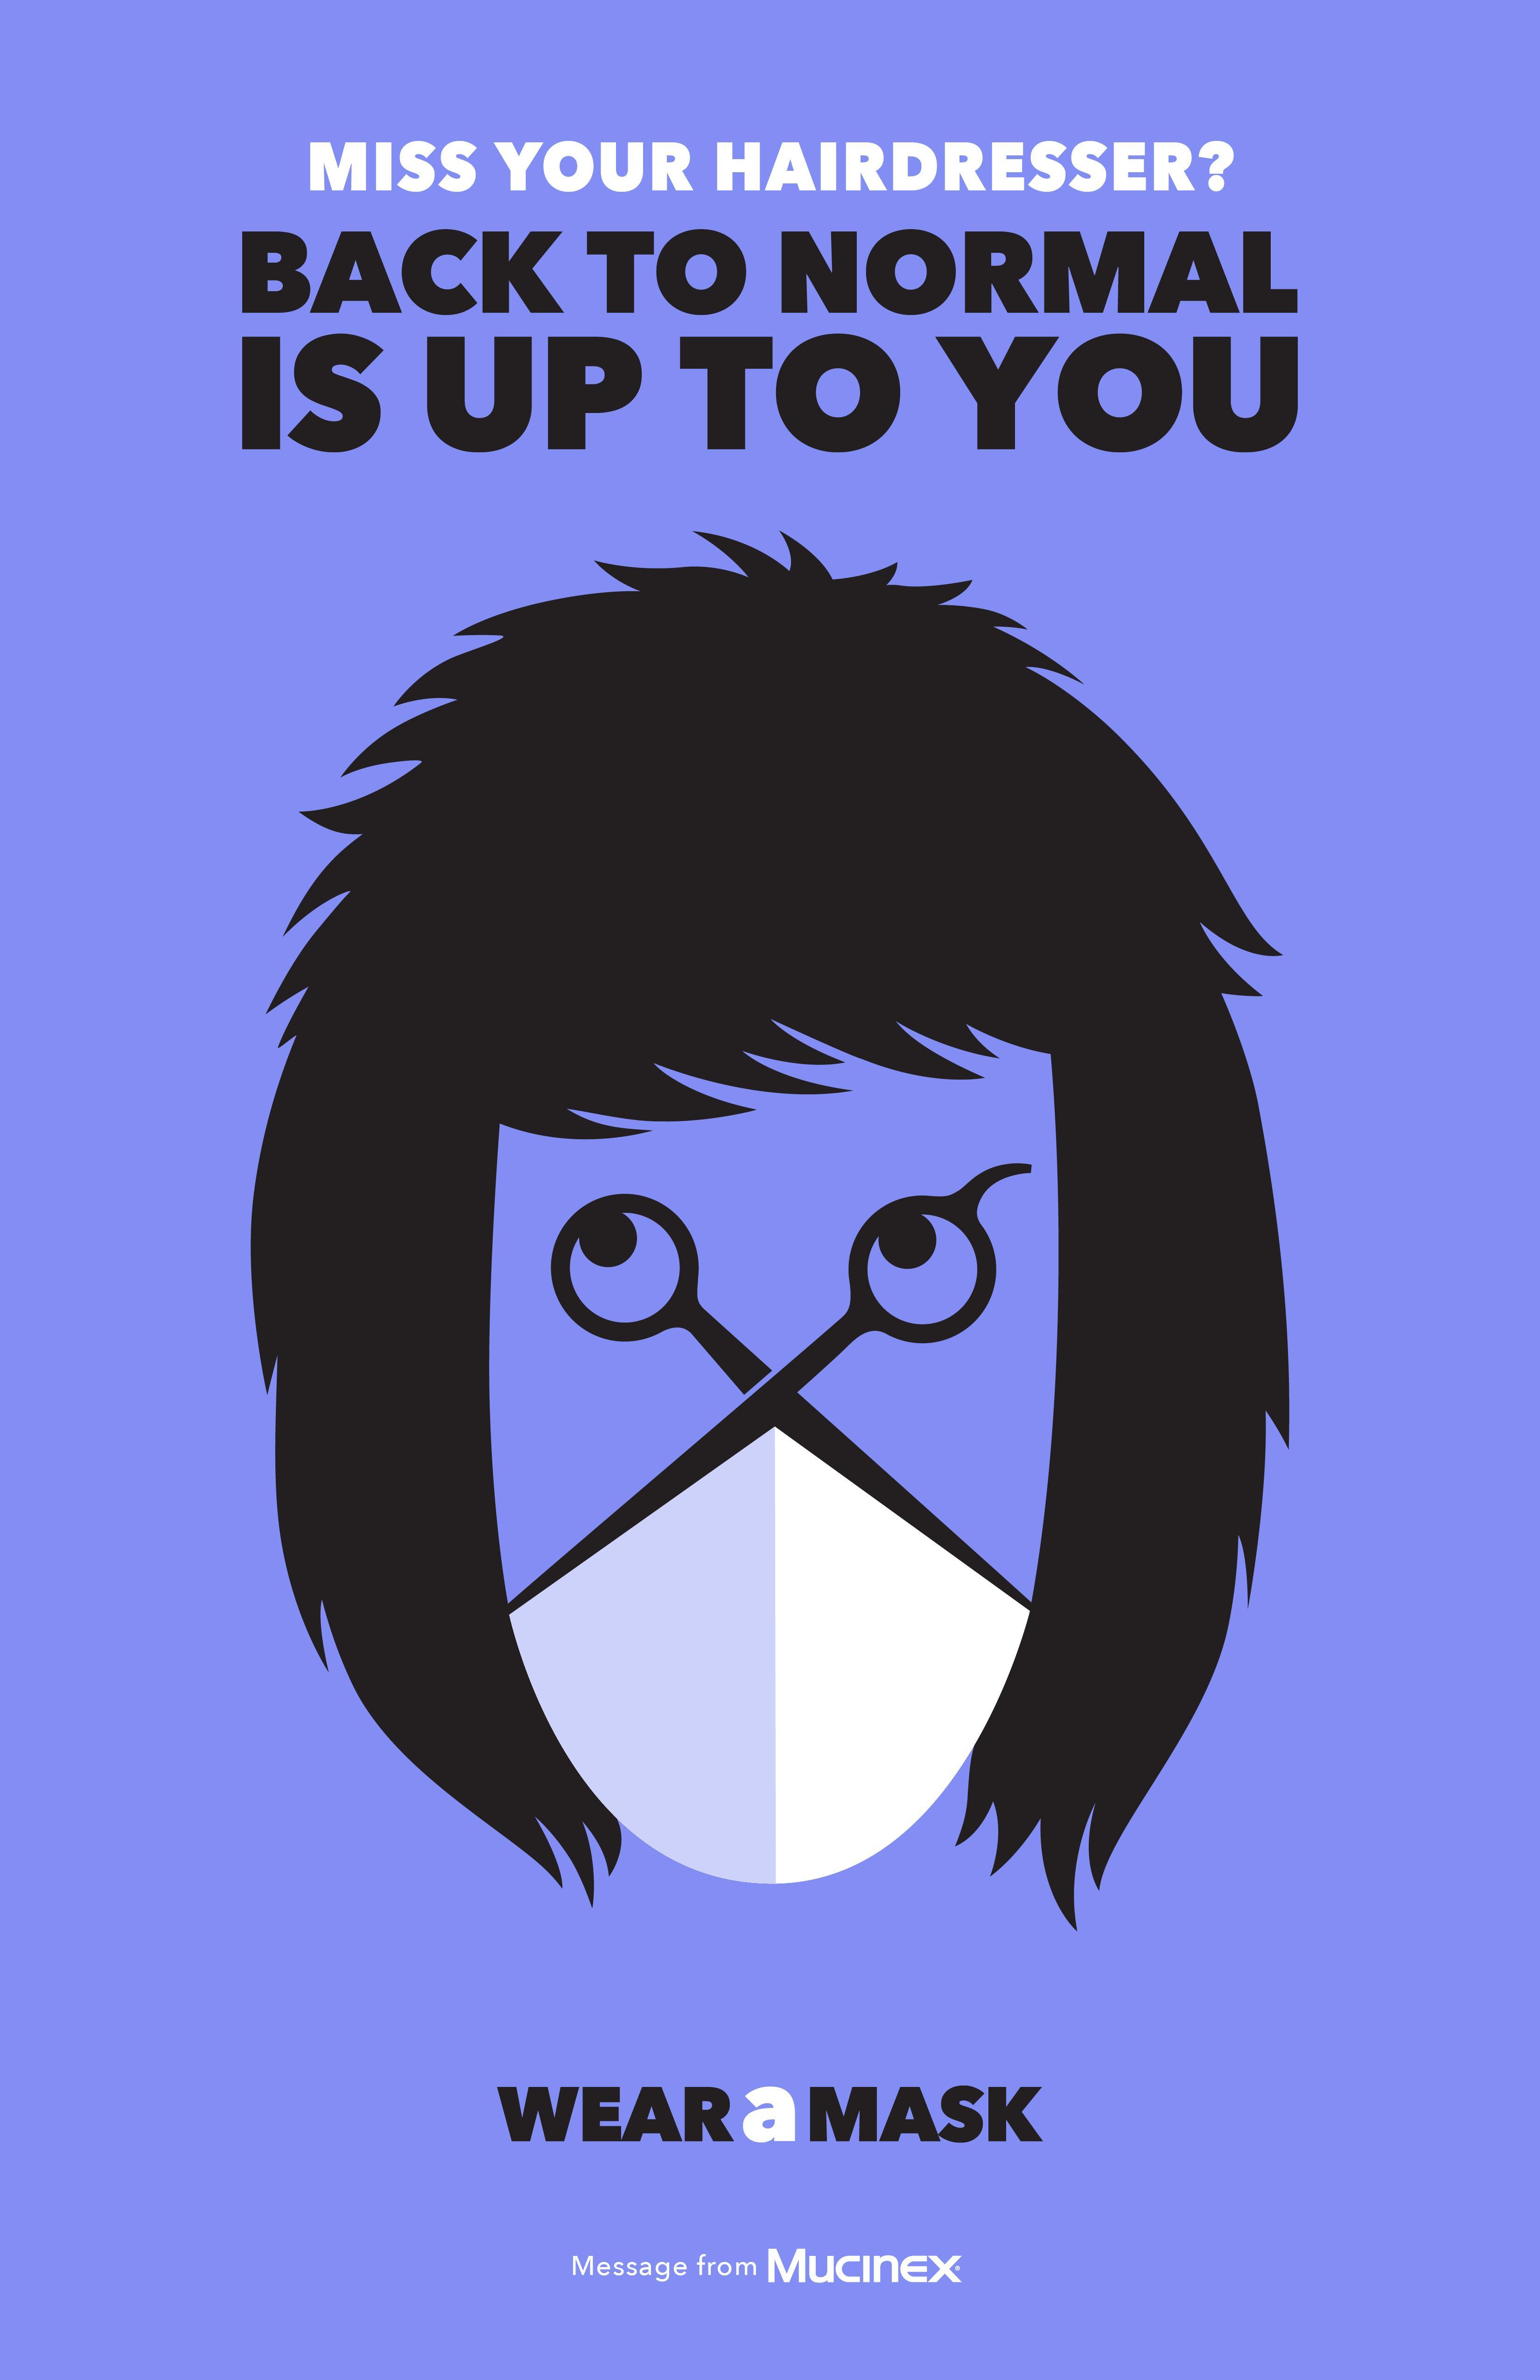 Mucinex - Wear a mask (Haircut)